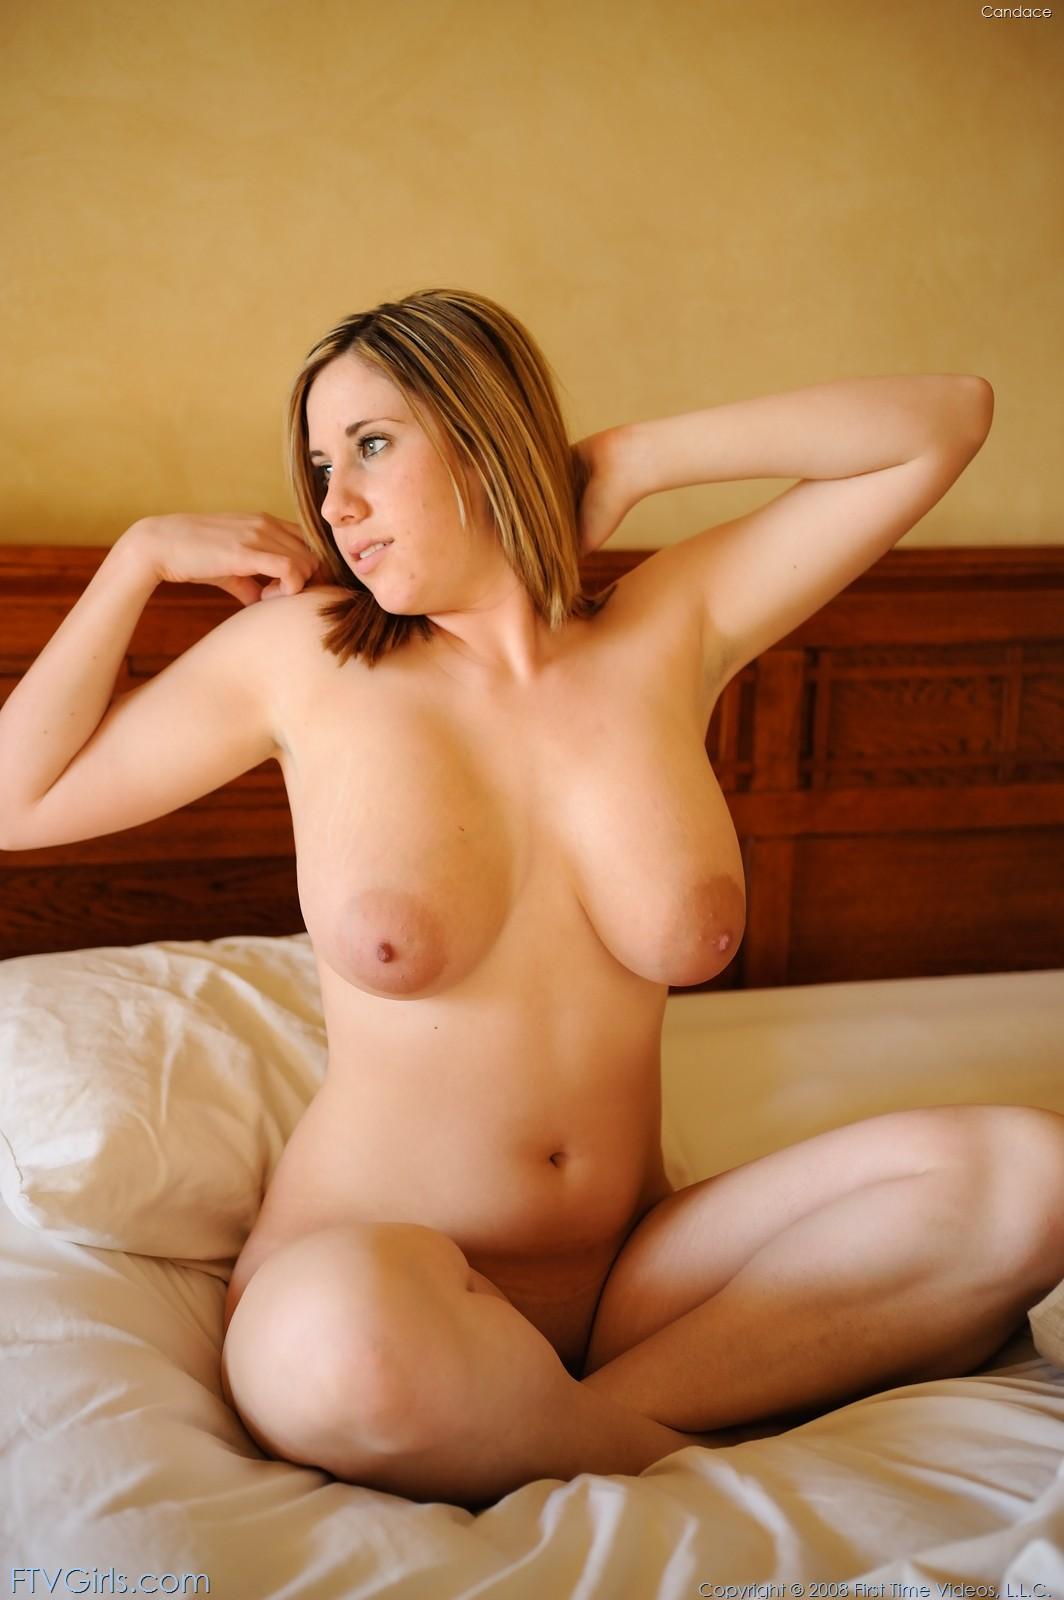 Amber easton nude videos